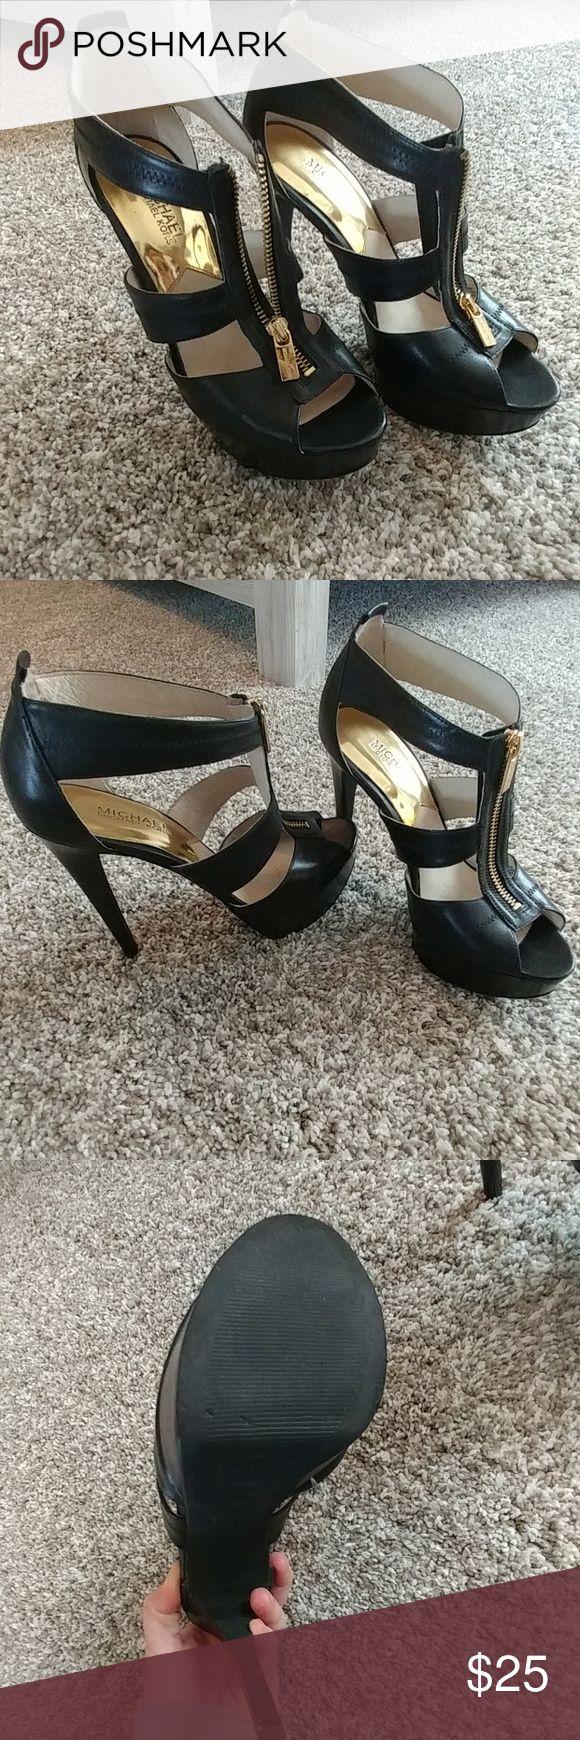 Michael Michael kors heels Black heels with gold zippers. Super chic! Had knee surgery so my days wearing tall heels are over 😭😭 MICHAEL Michael Kors Shoes Heels